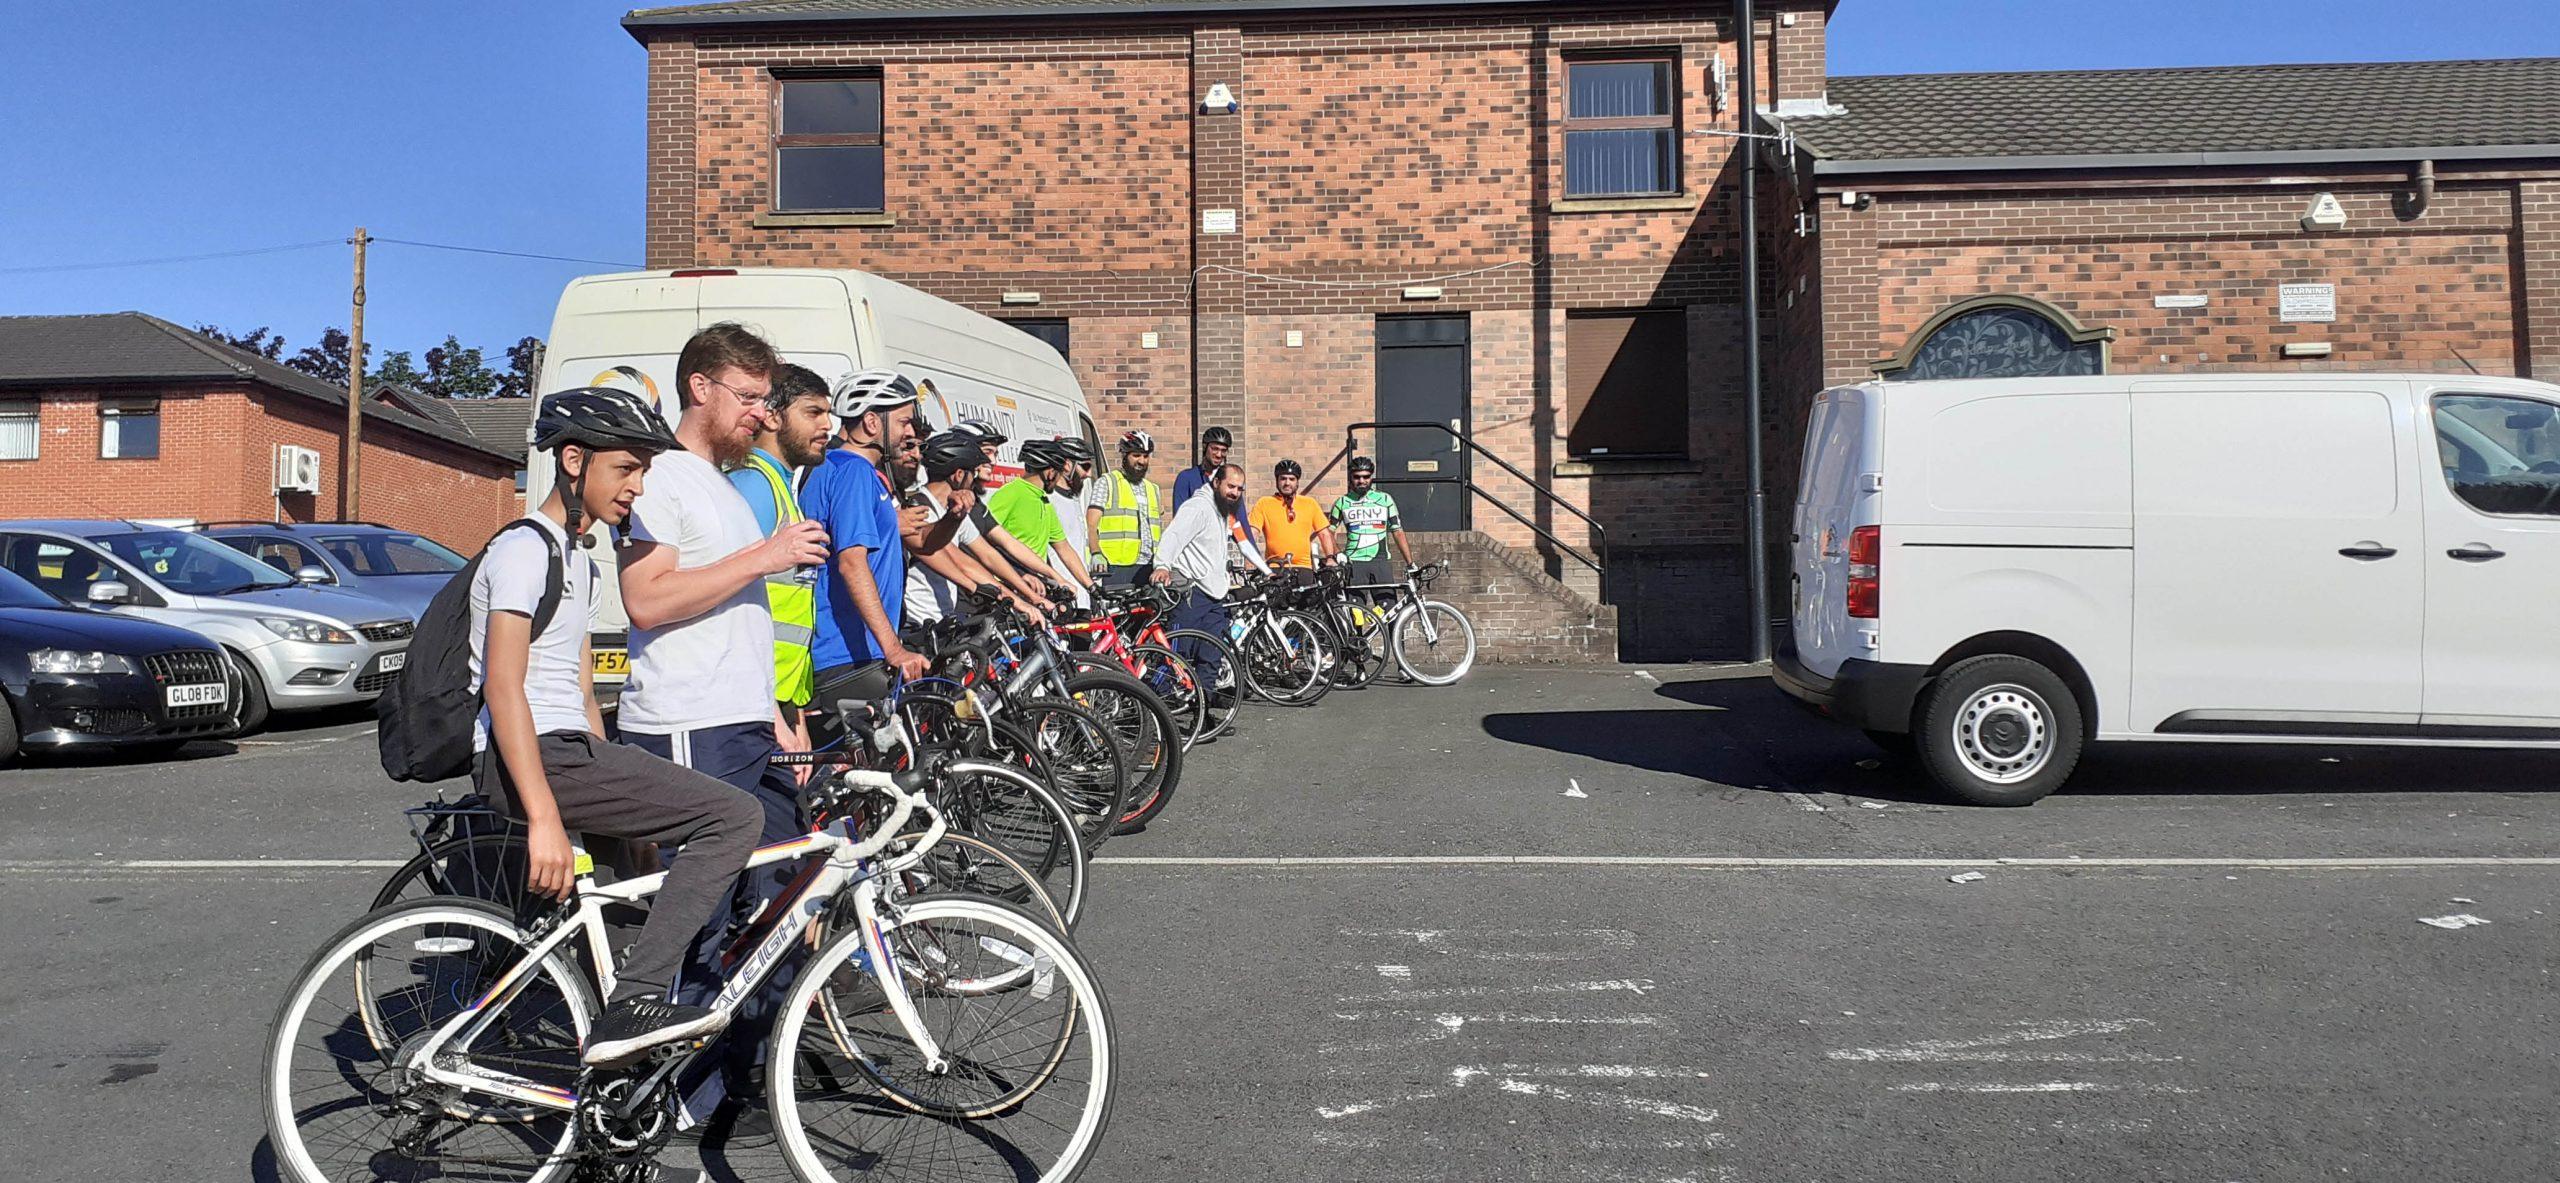 Yemen charity cycle ride   Muslim Cyclists   AICC